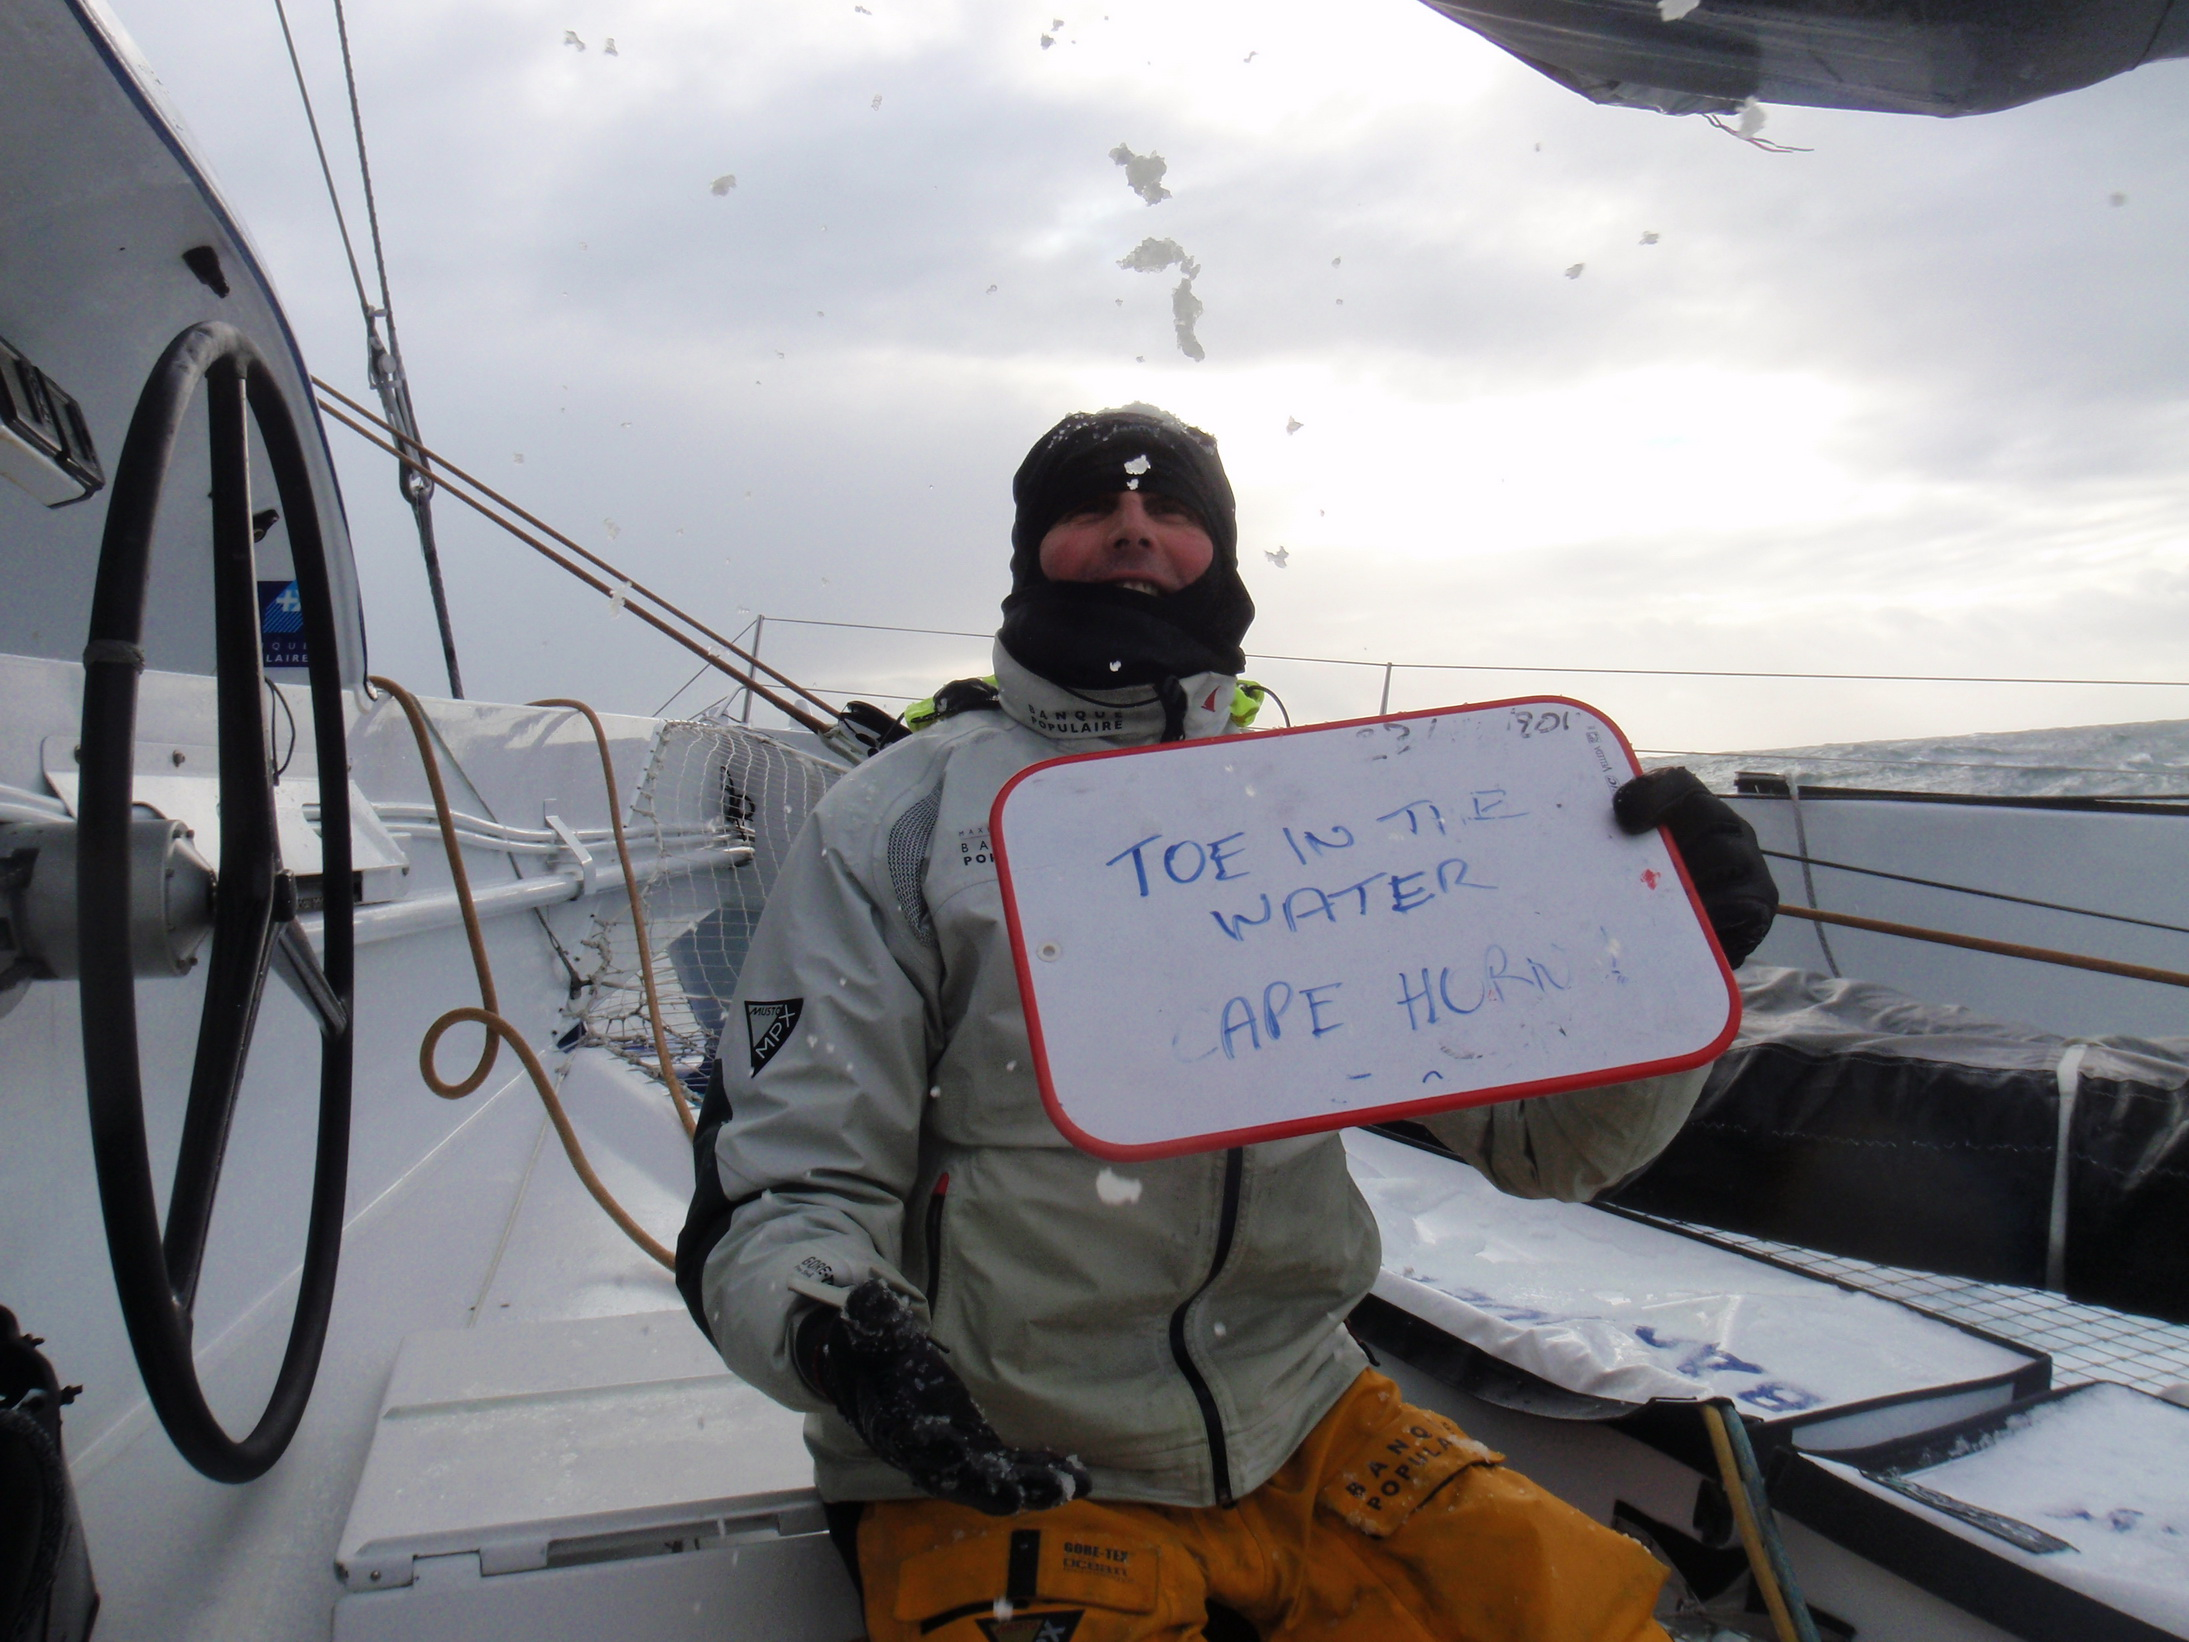 Photo envoyee du bord  Passage du Cap horn  Brian Thompson - 24122011 - BPCE